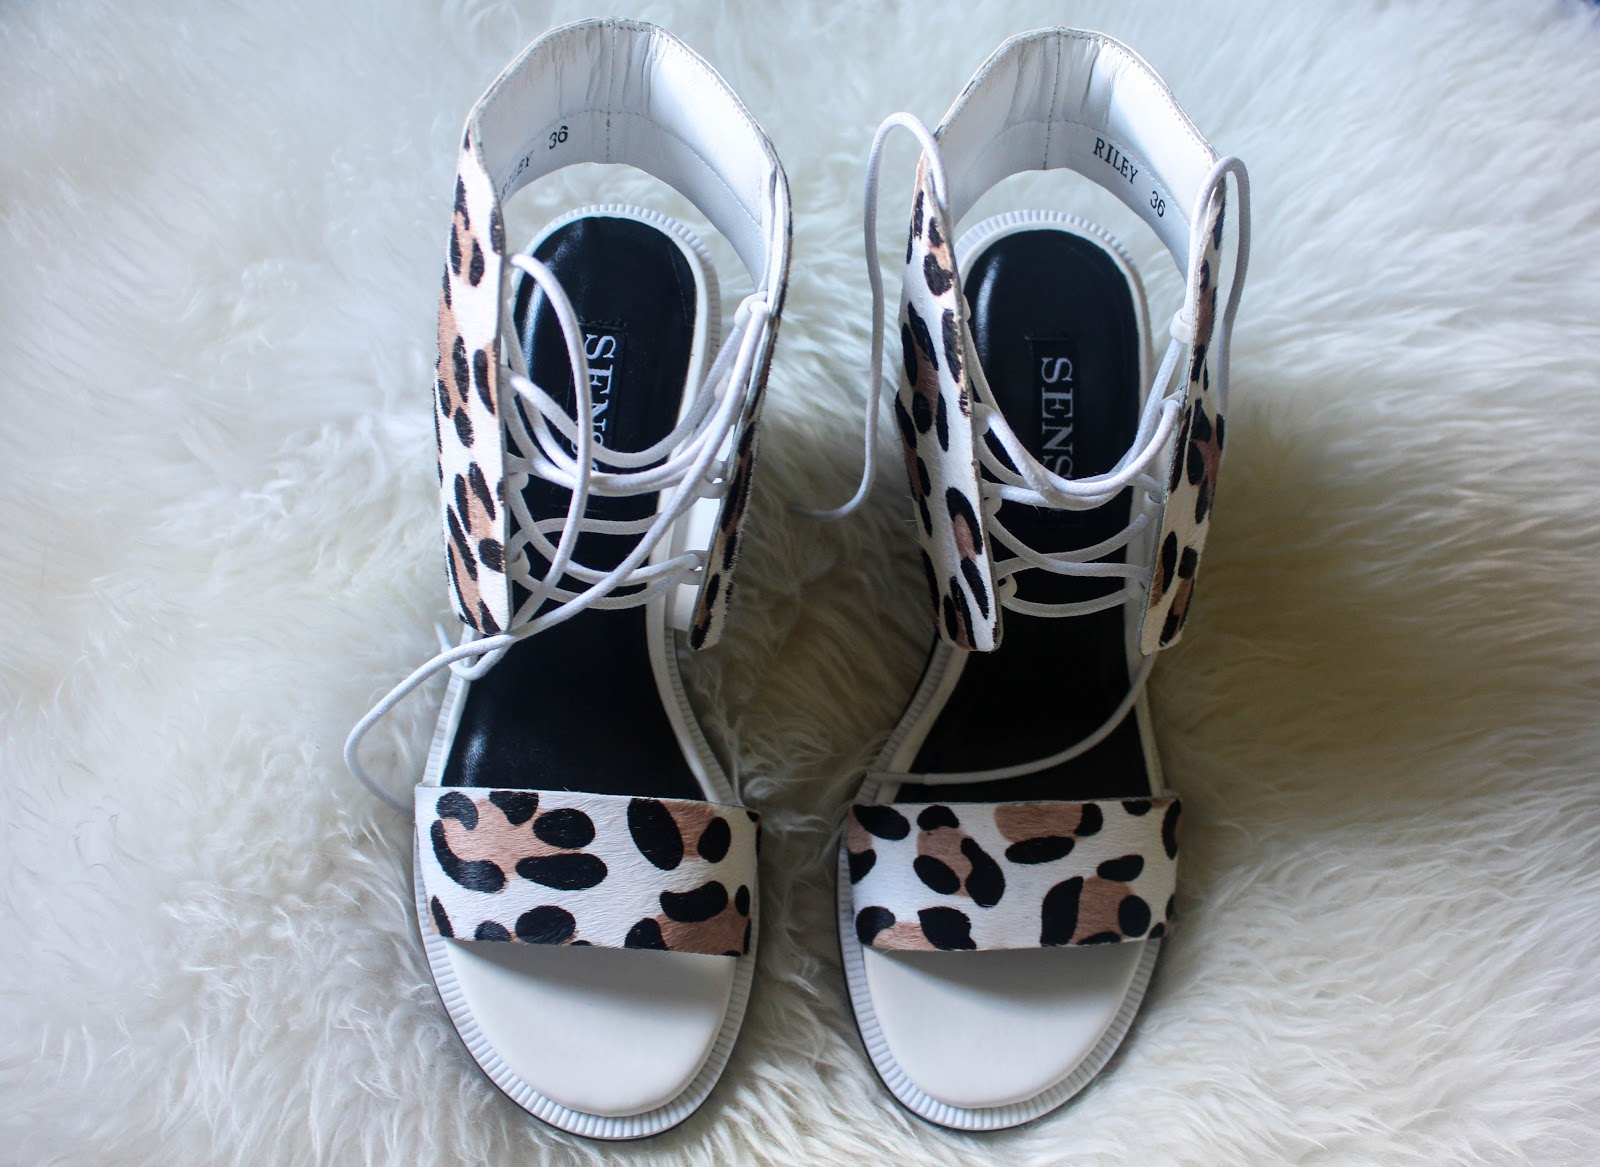 senso, senso footwear, krystel couture, designer, style blog,